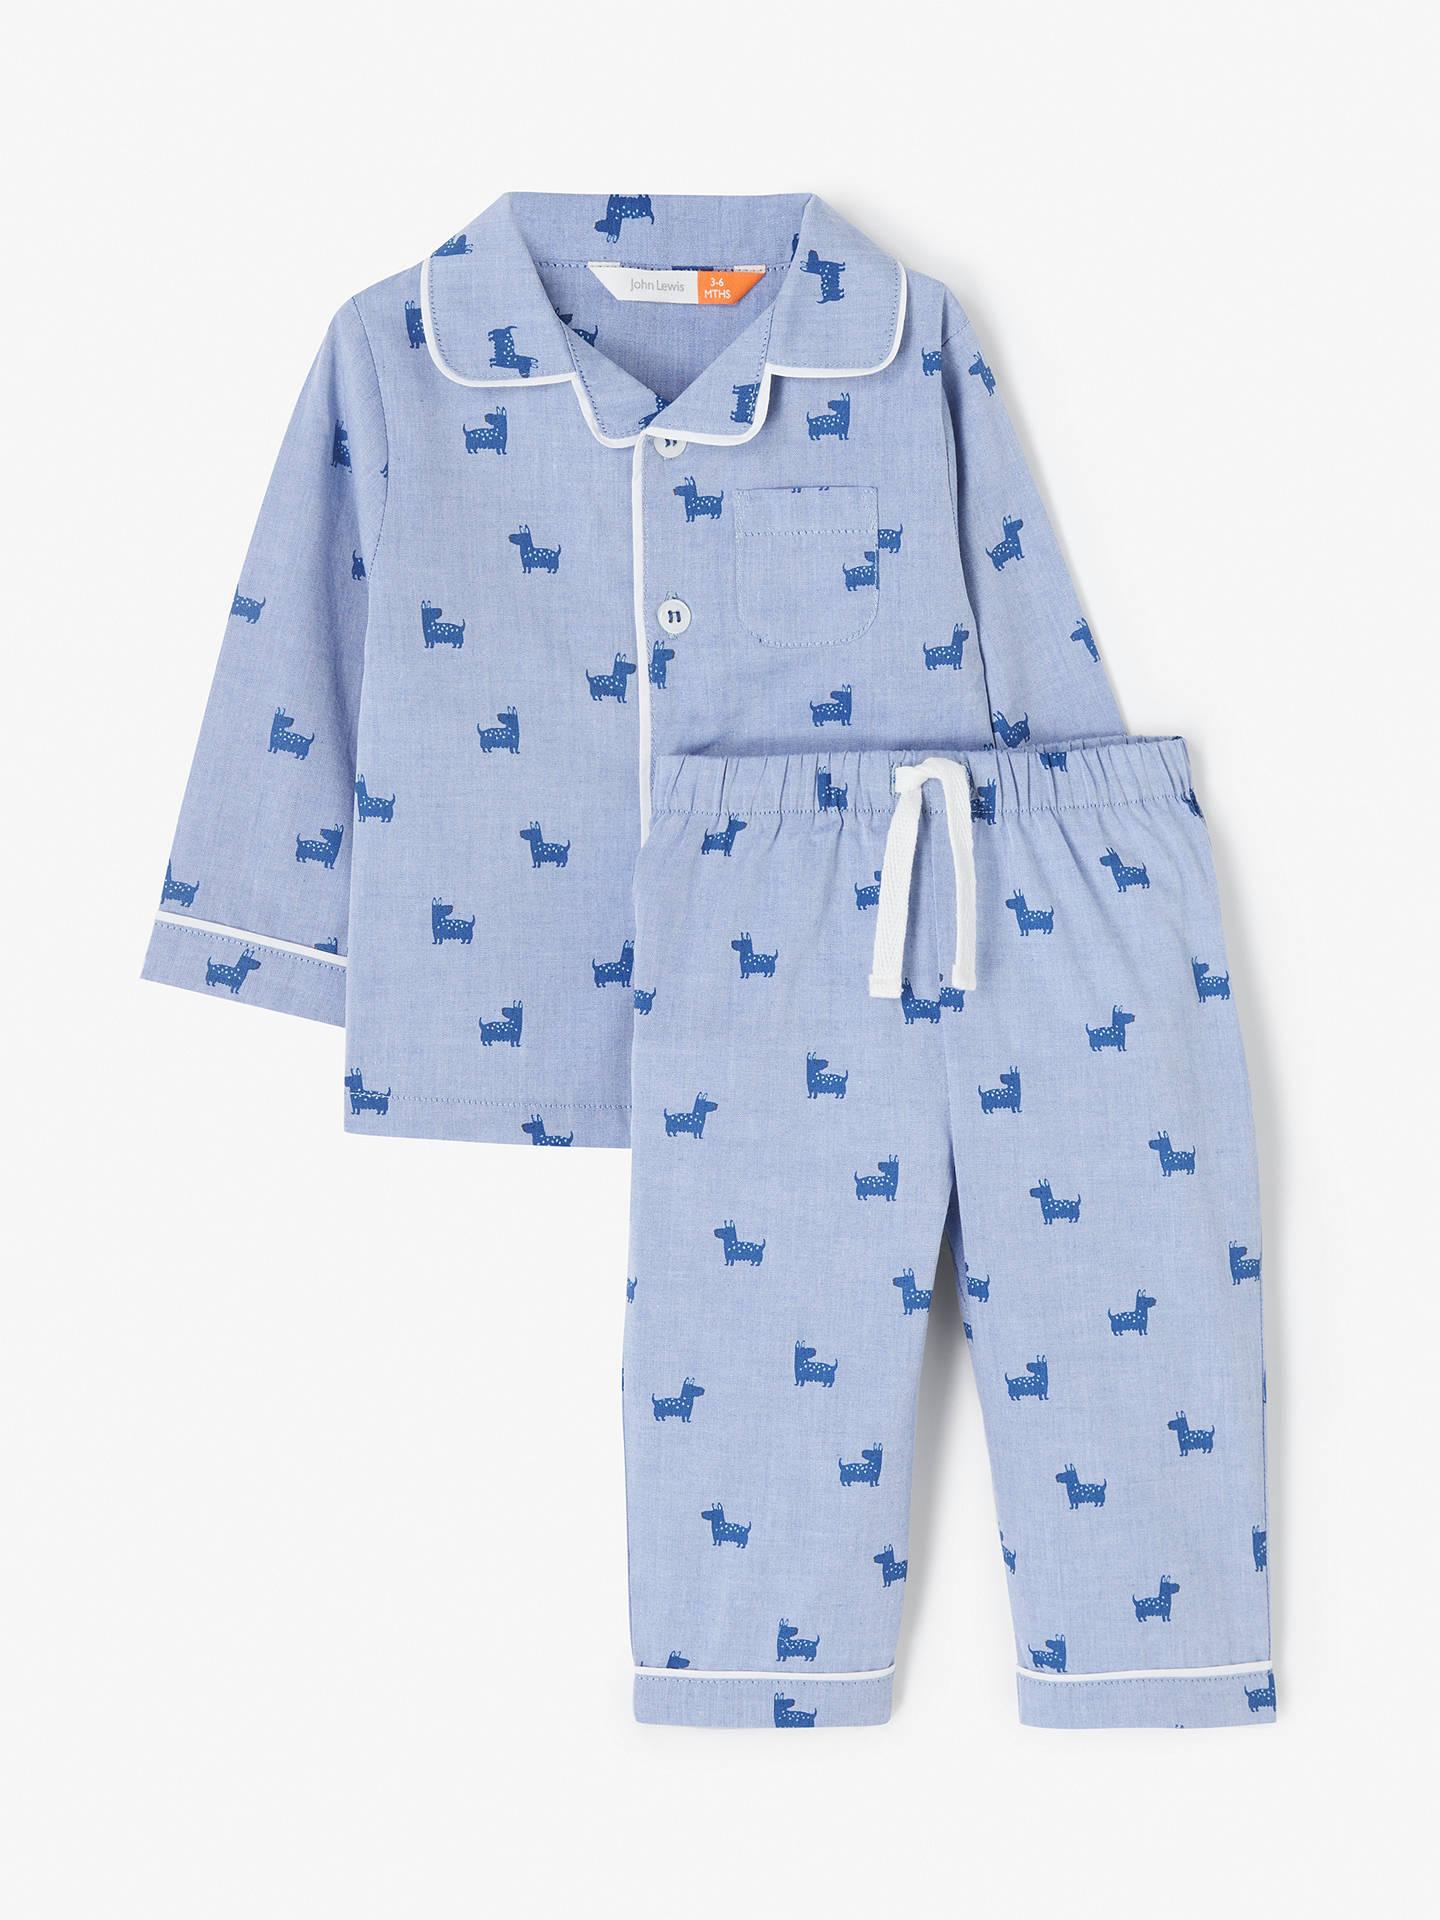 fc38e3da77b1 John Lewis & Partners Baby Dog Print Pyjama Set, Blue at John Lewis ...